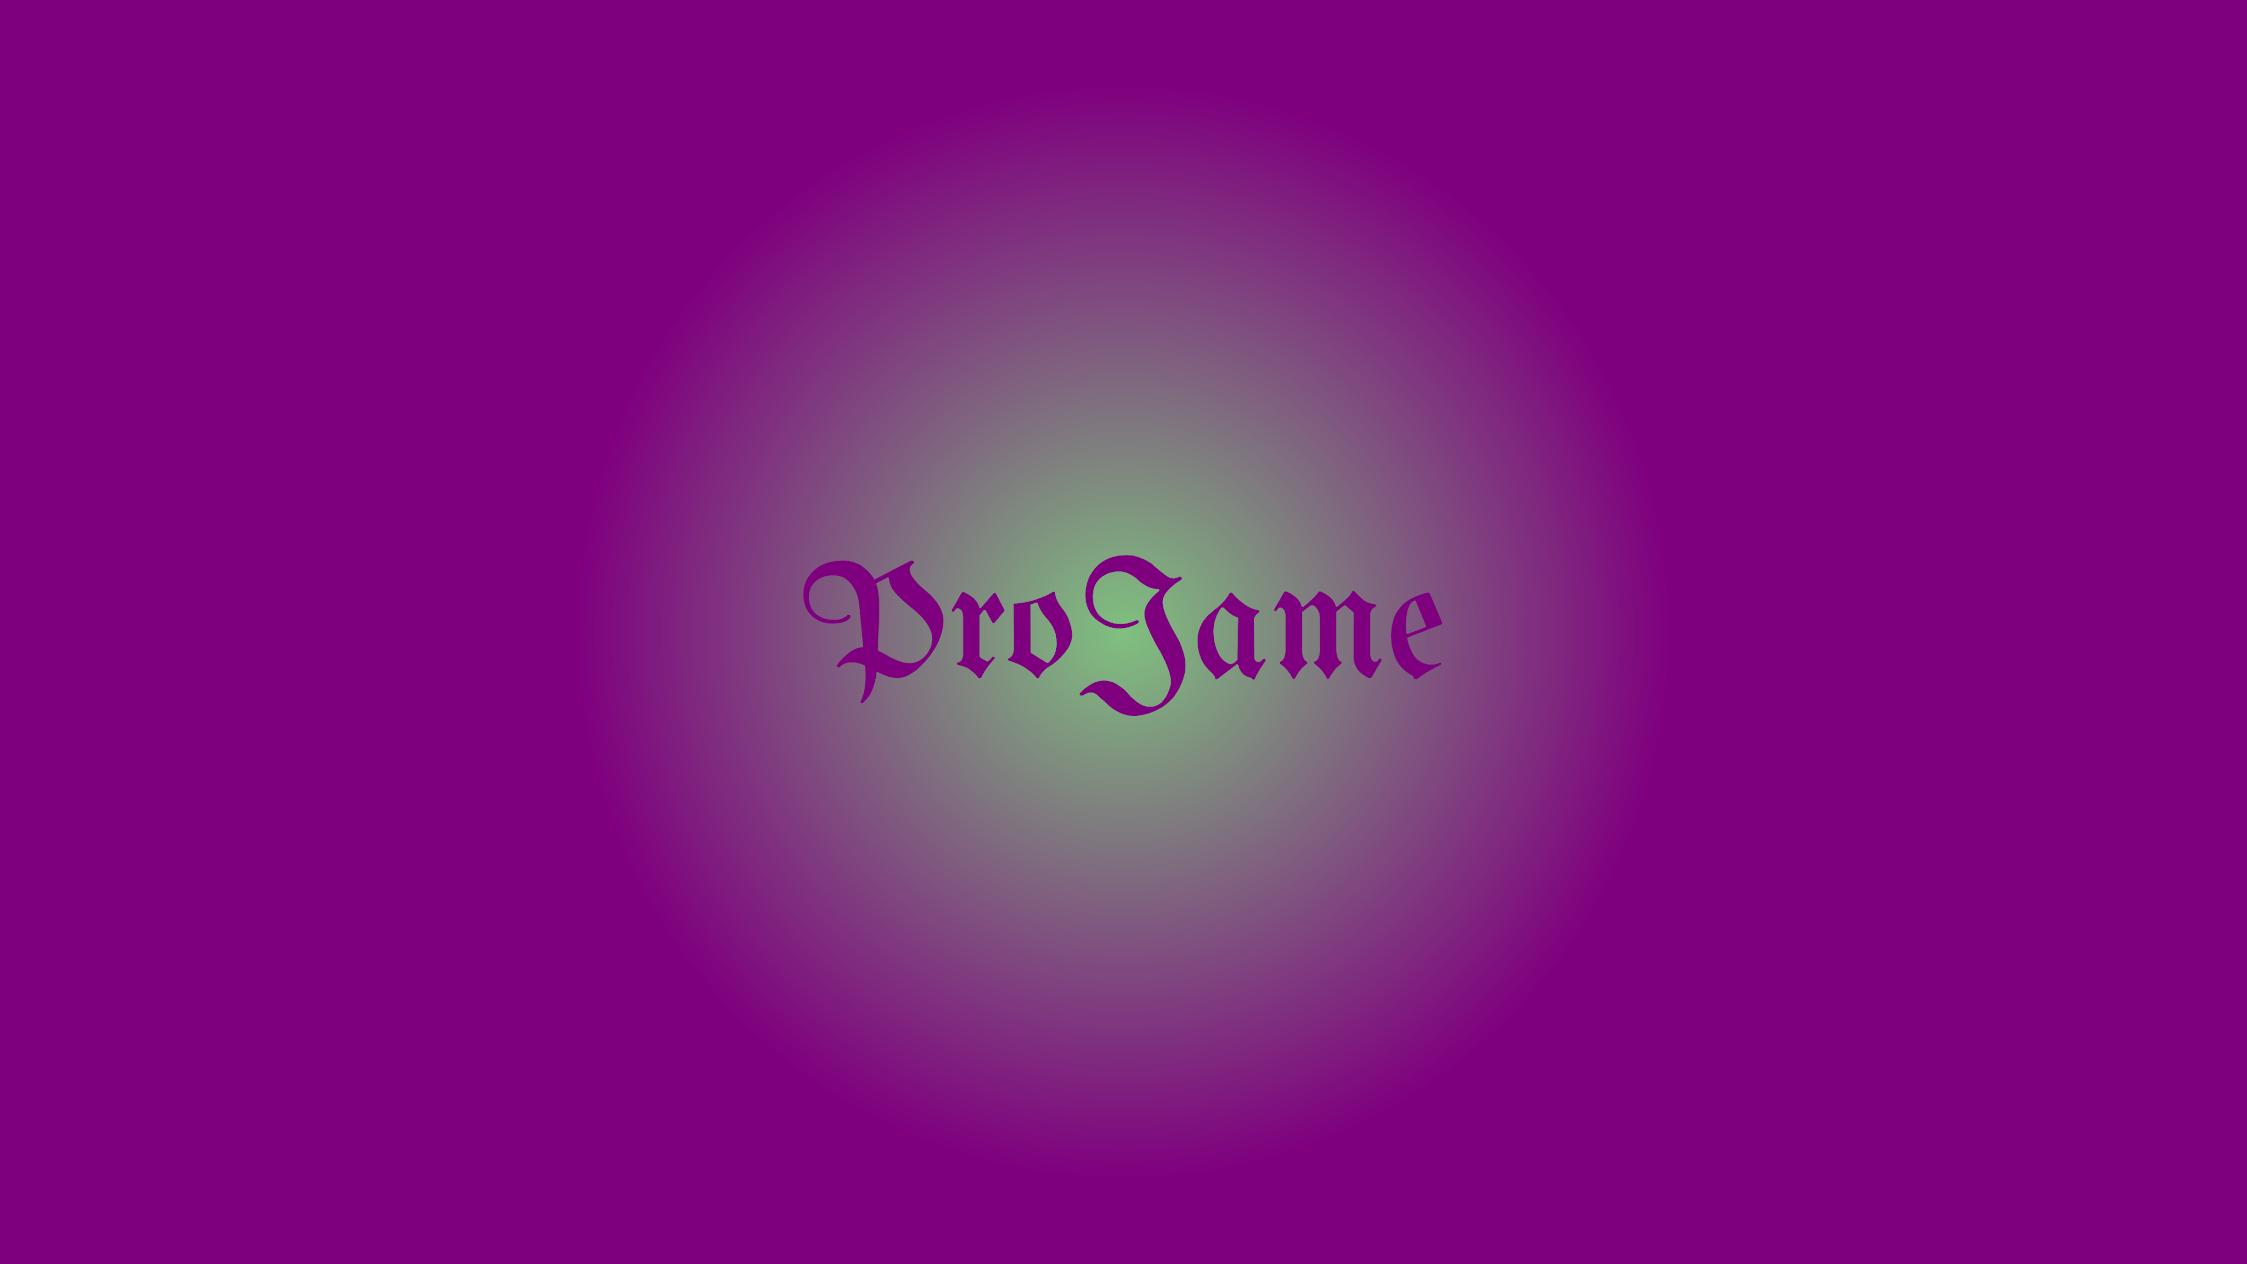 ProJame